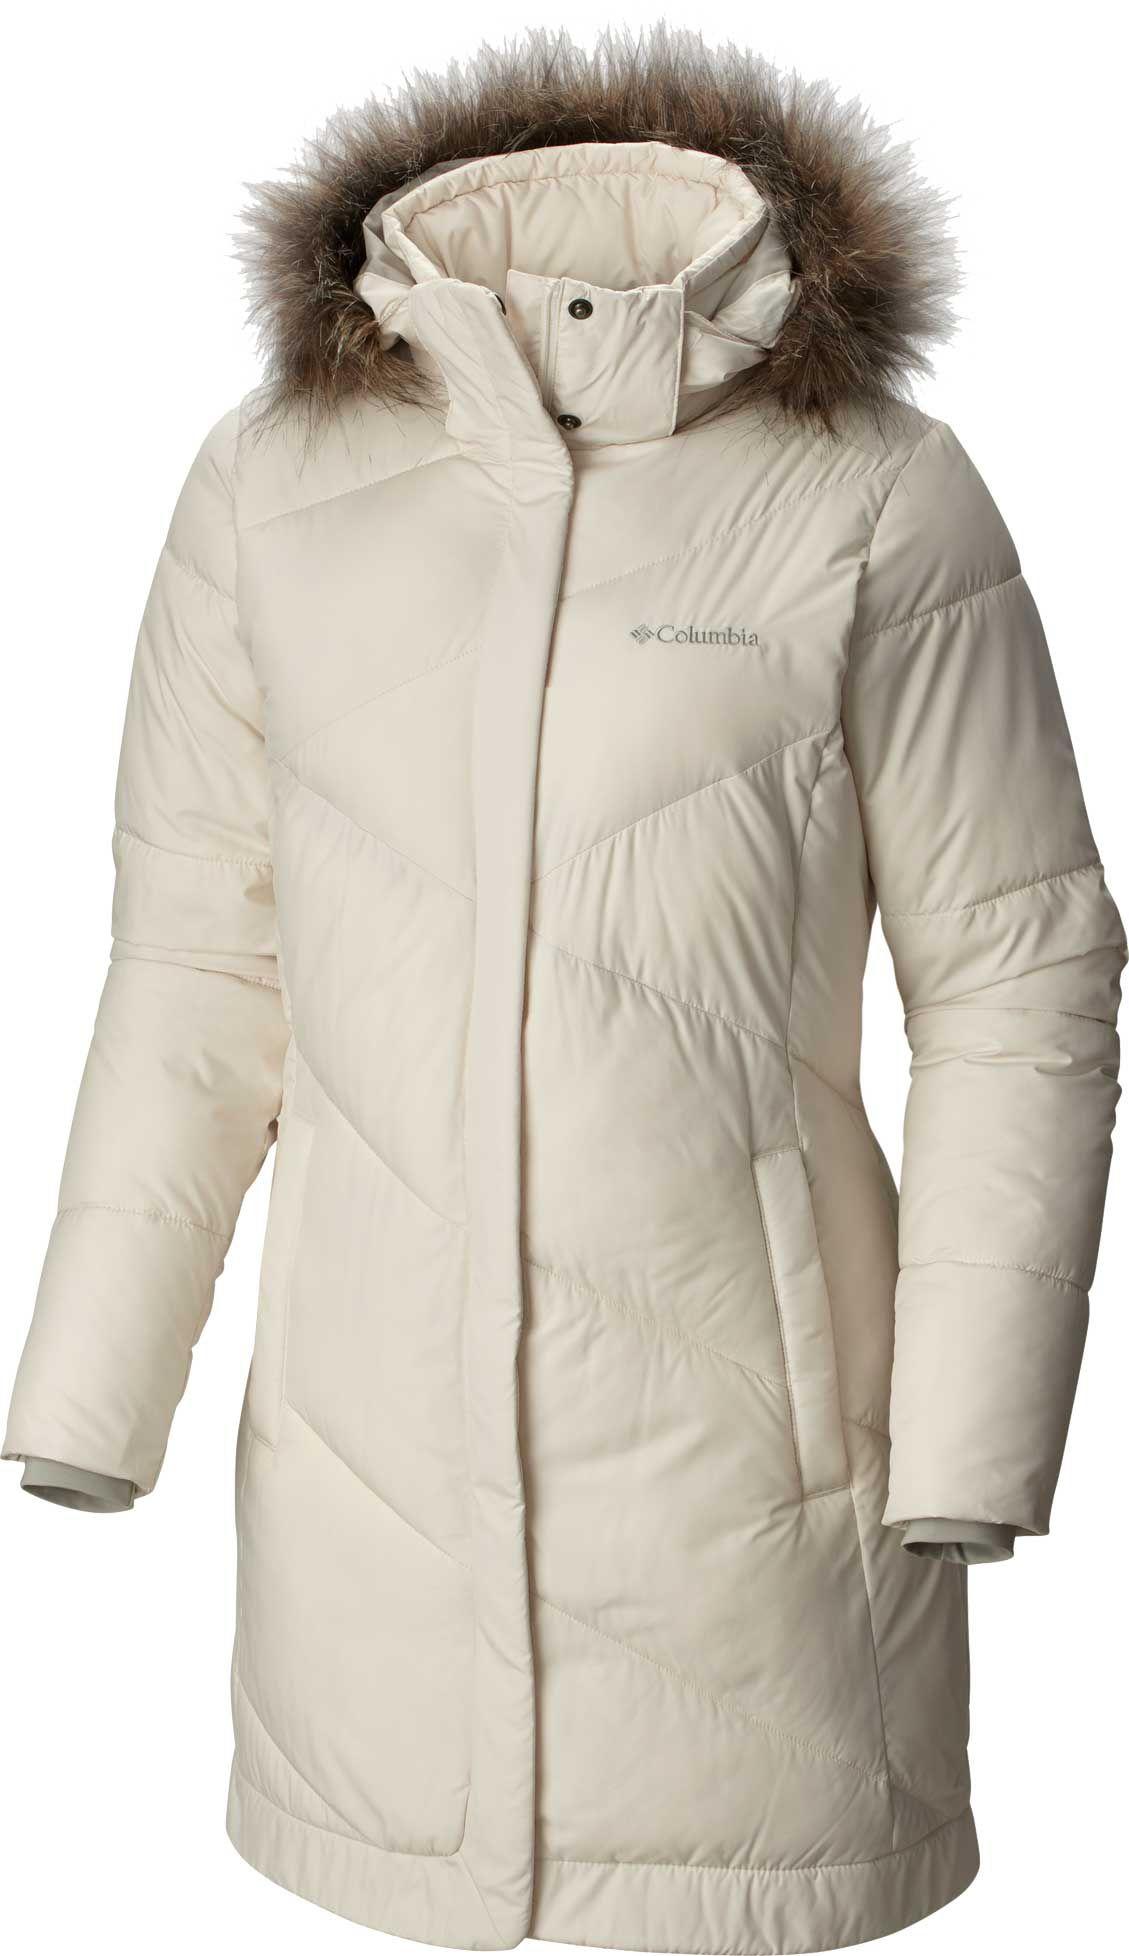 Columbia Women's Snow Eclipse Mid Insulated Jacket. 0:00. 0:00 / 0:00.  noImageFound ???